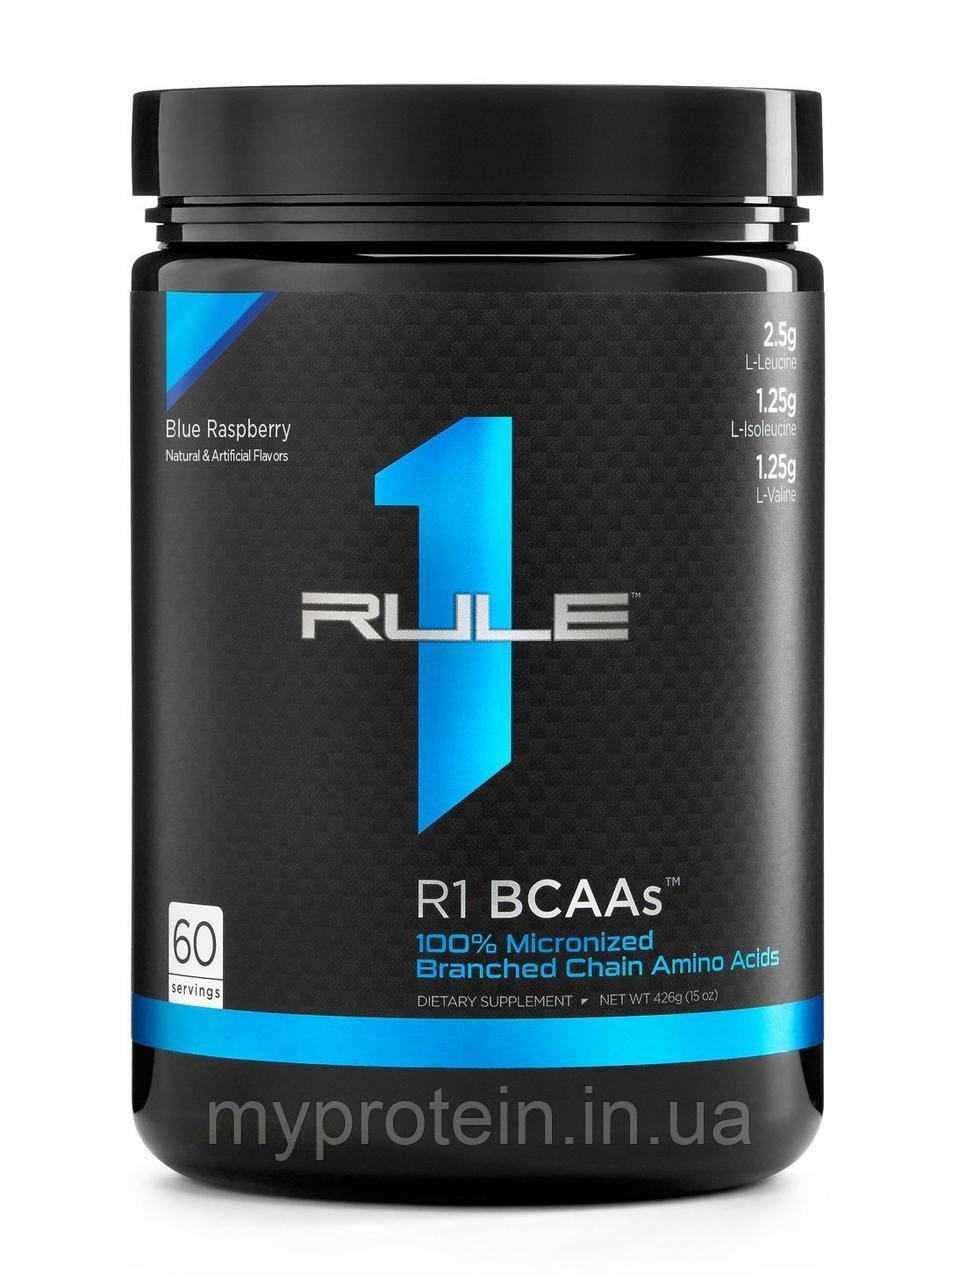 R1 (Rule One)BCAAR1 Train BCAAs755 g